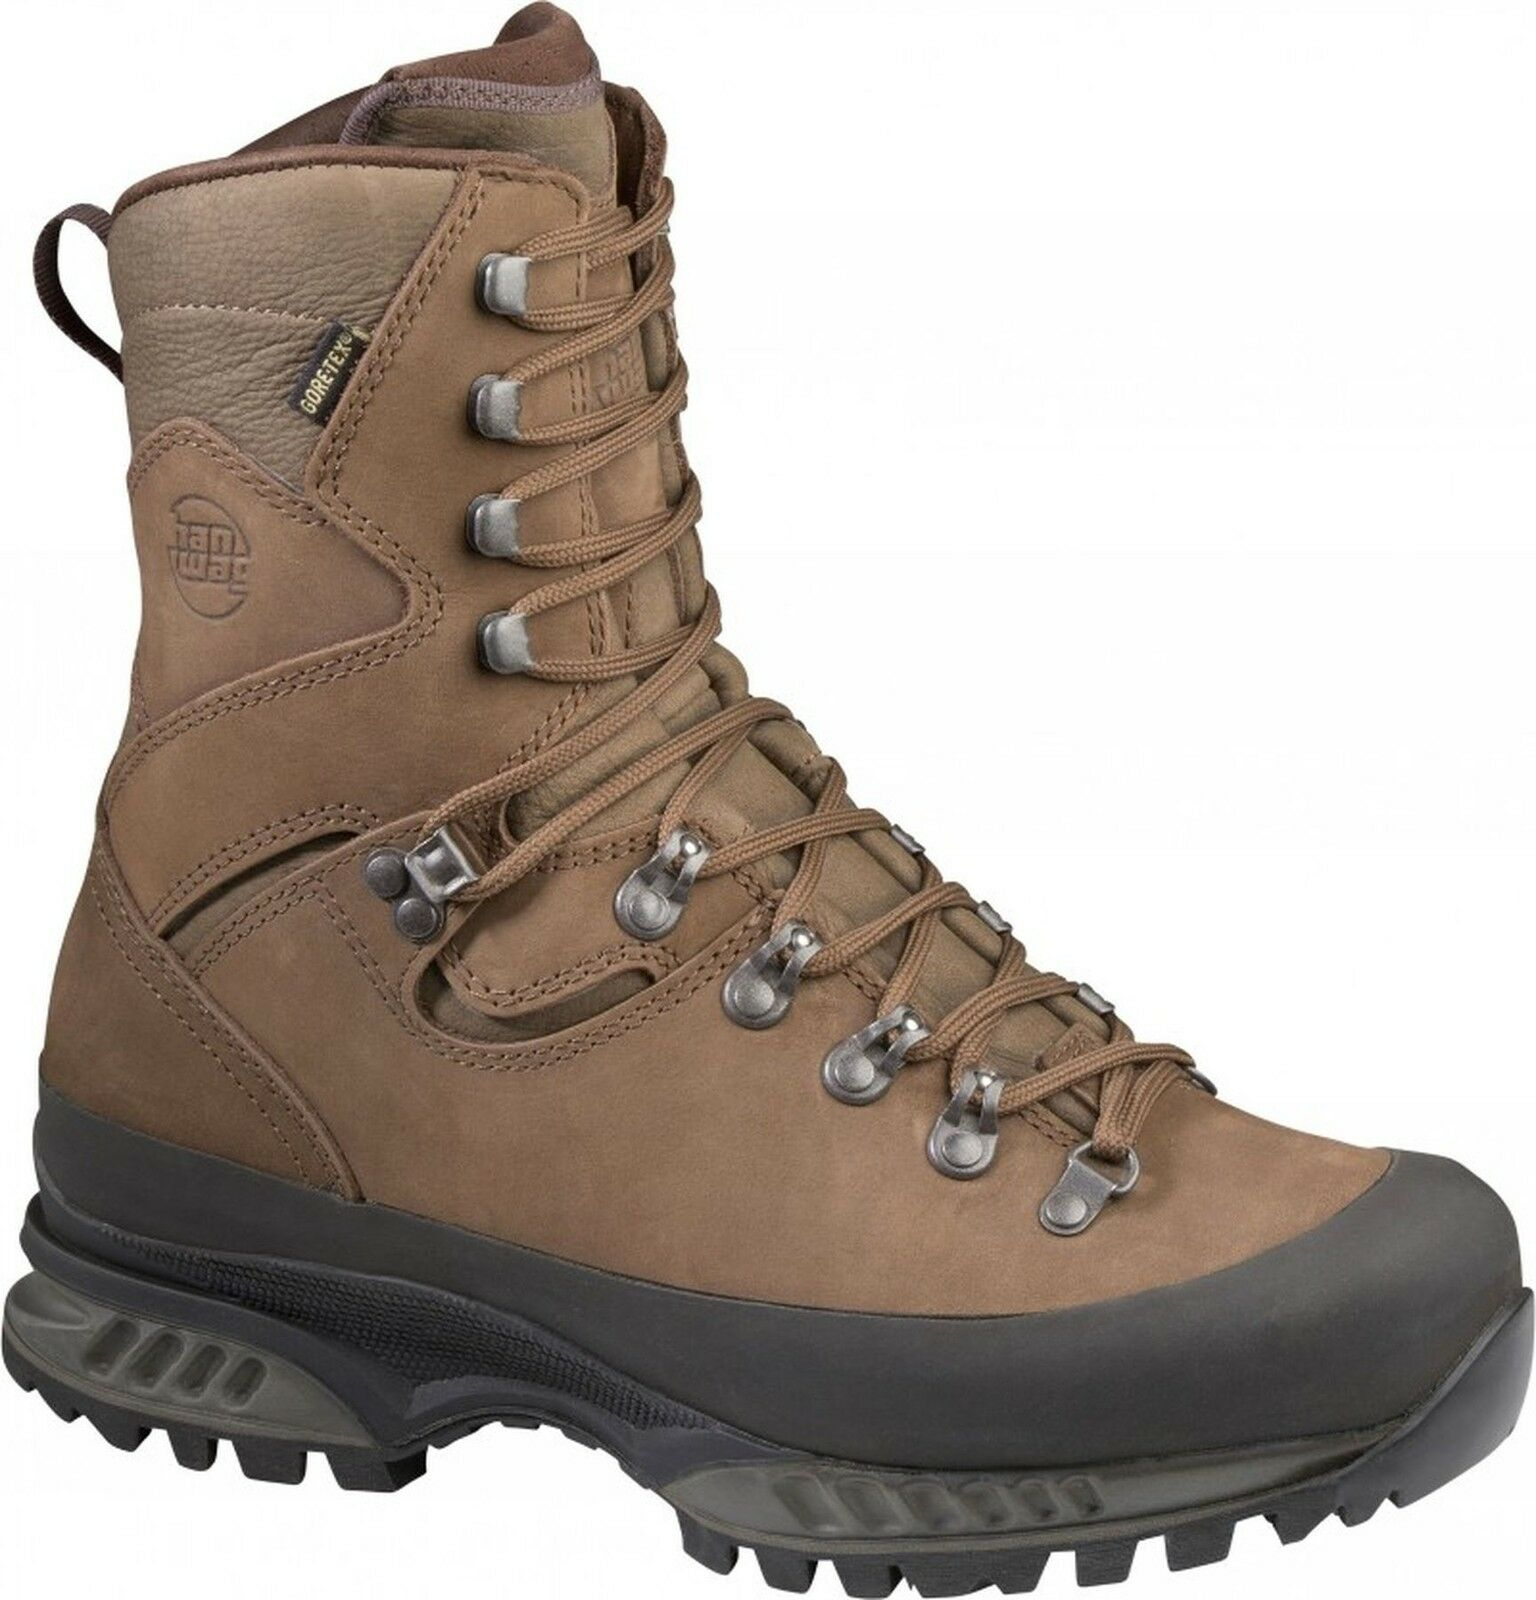 Hanwag Mountain schoenen  Tatra Top Breed Gore-Tex afmeting 11 --46 Aarde